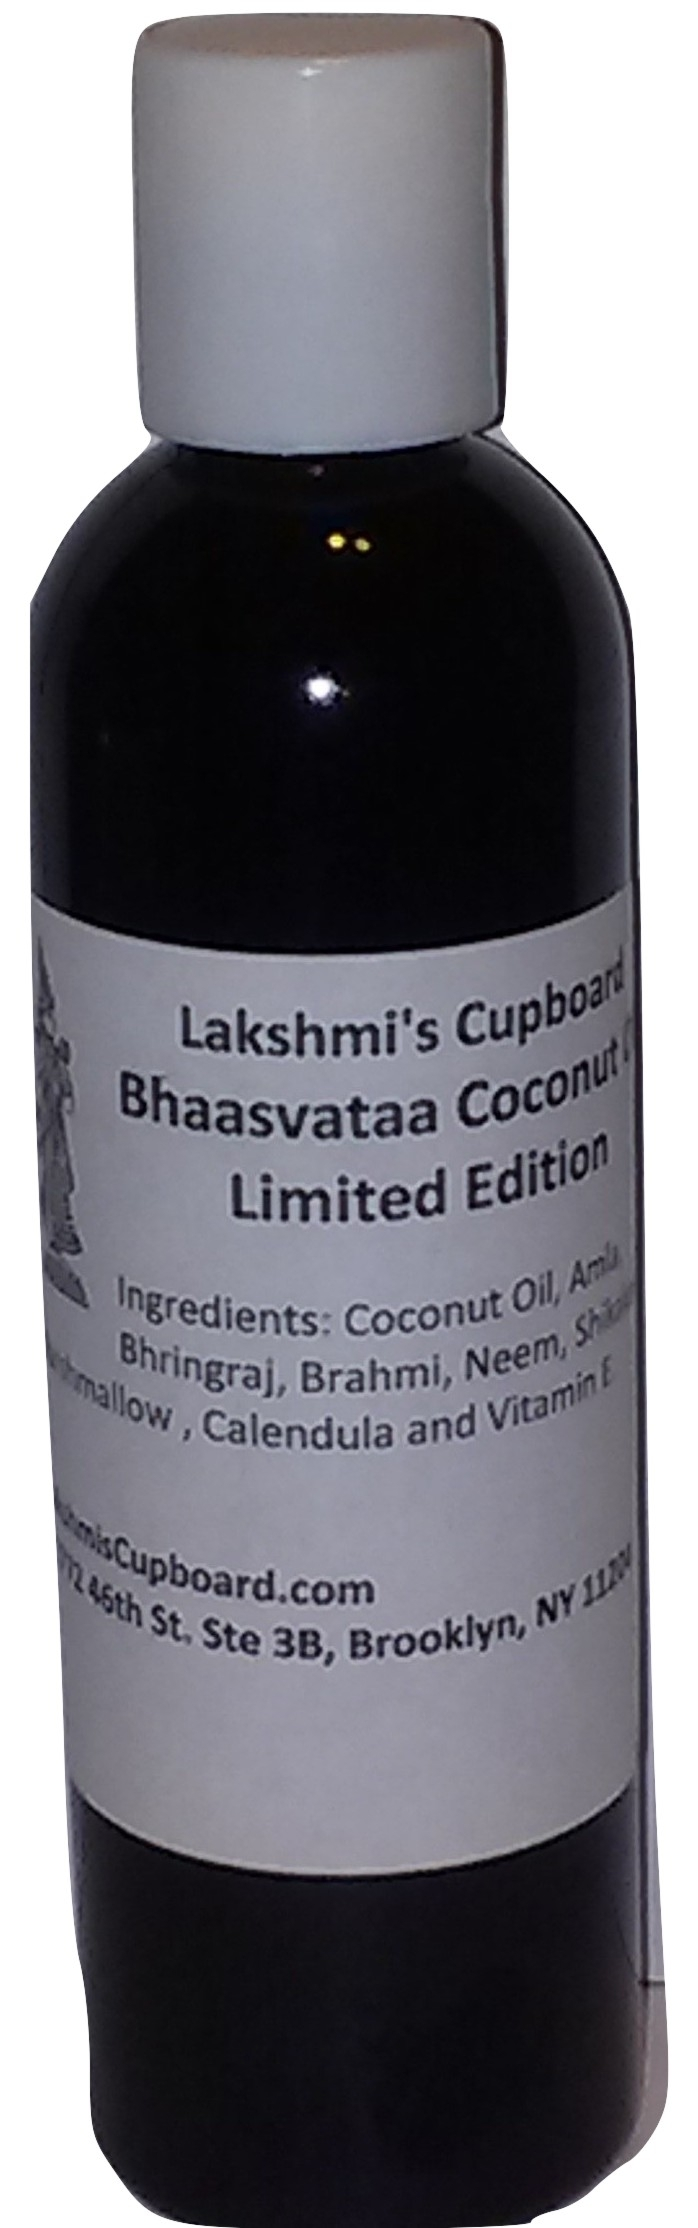 Bhaasvataa Coconut Oil w/ Amla, Shikakai, Neem Bhringraj, Calendula, Marshmallow and Brahmi (Limited Edition) 4 oz 000